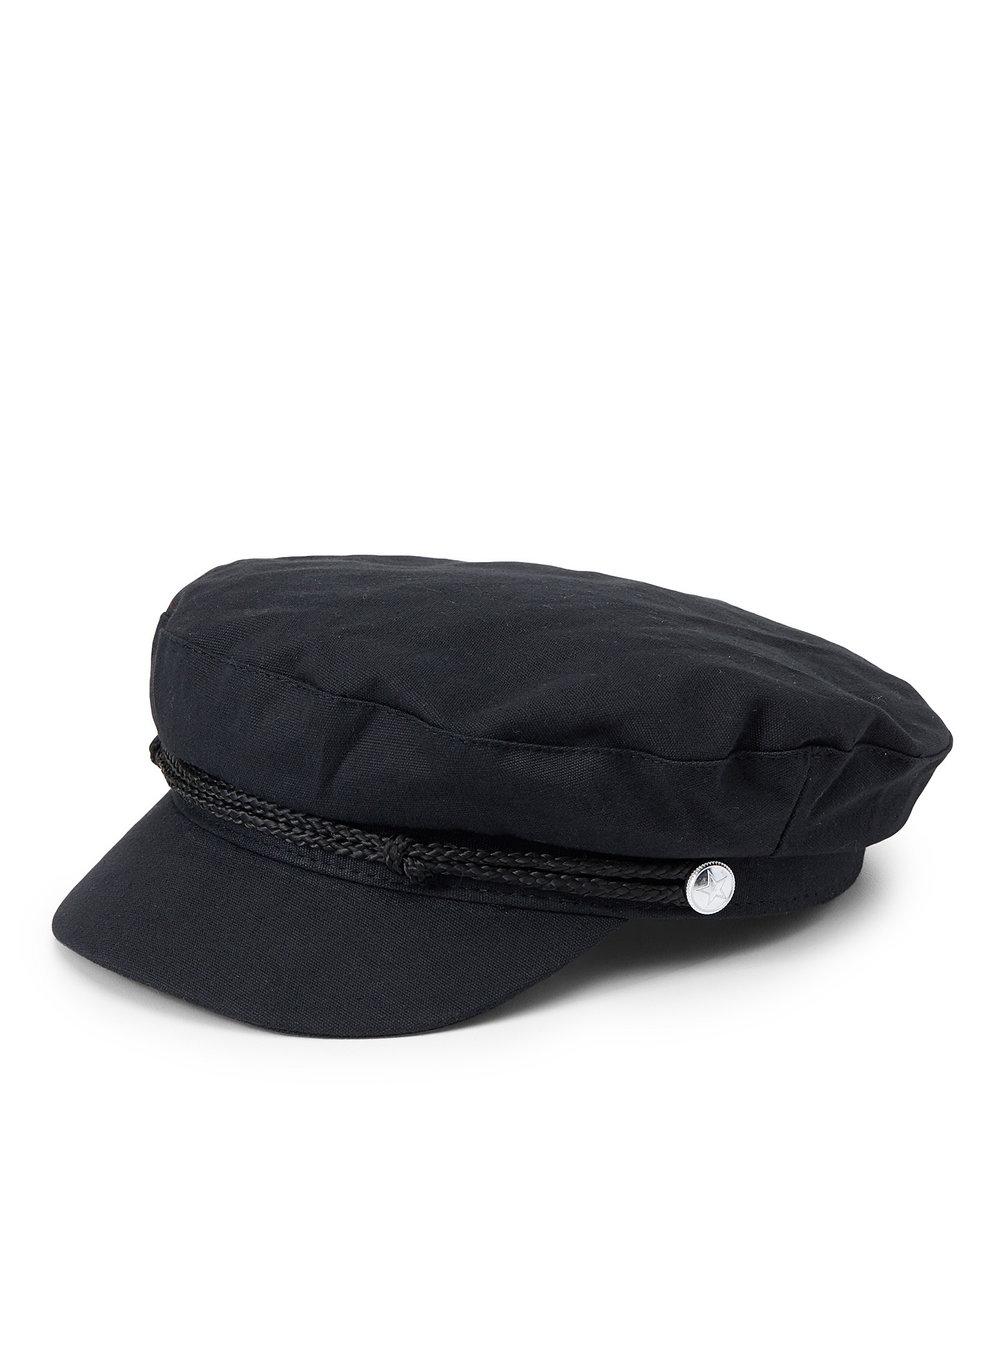 Captain Newsboy Cap